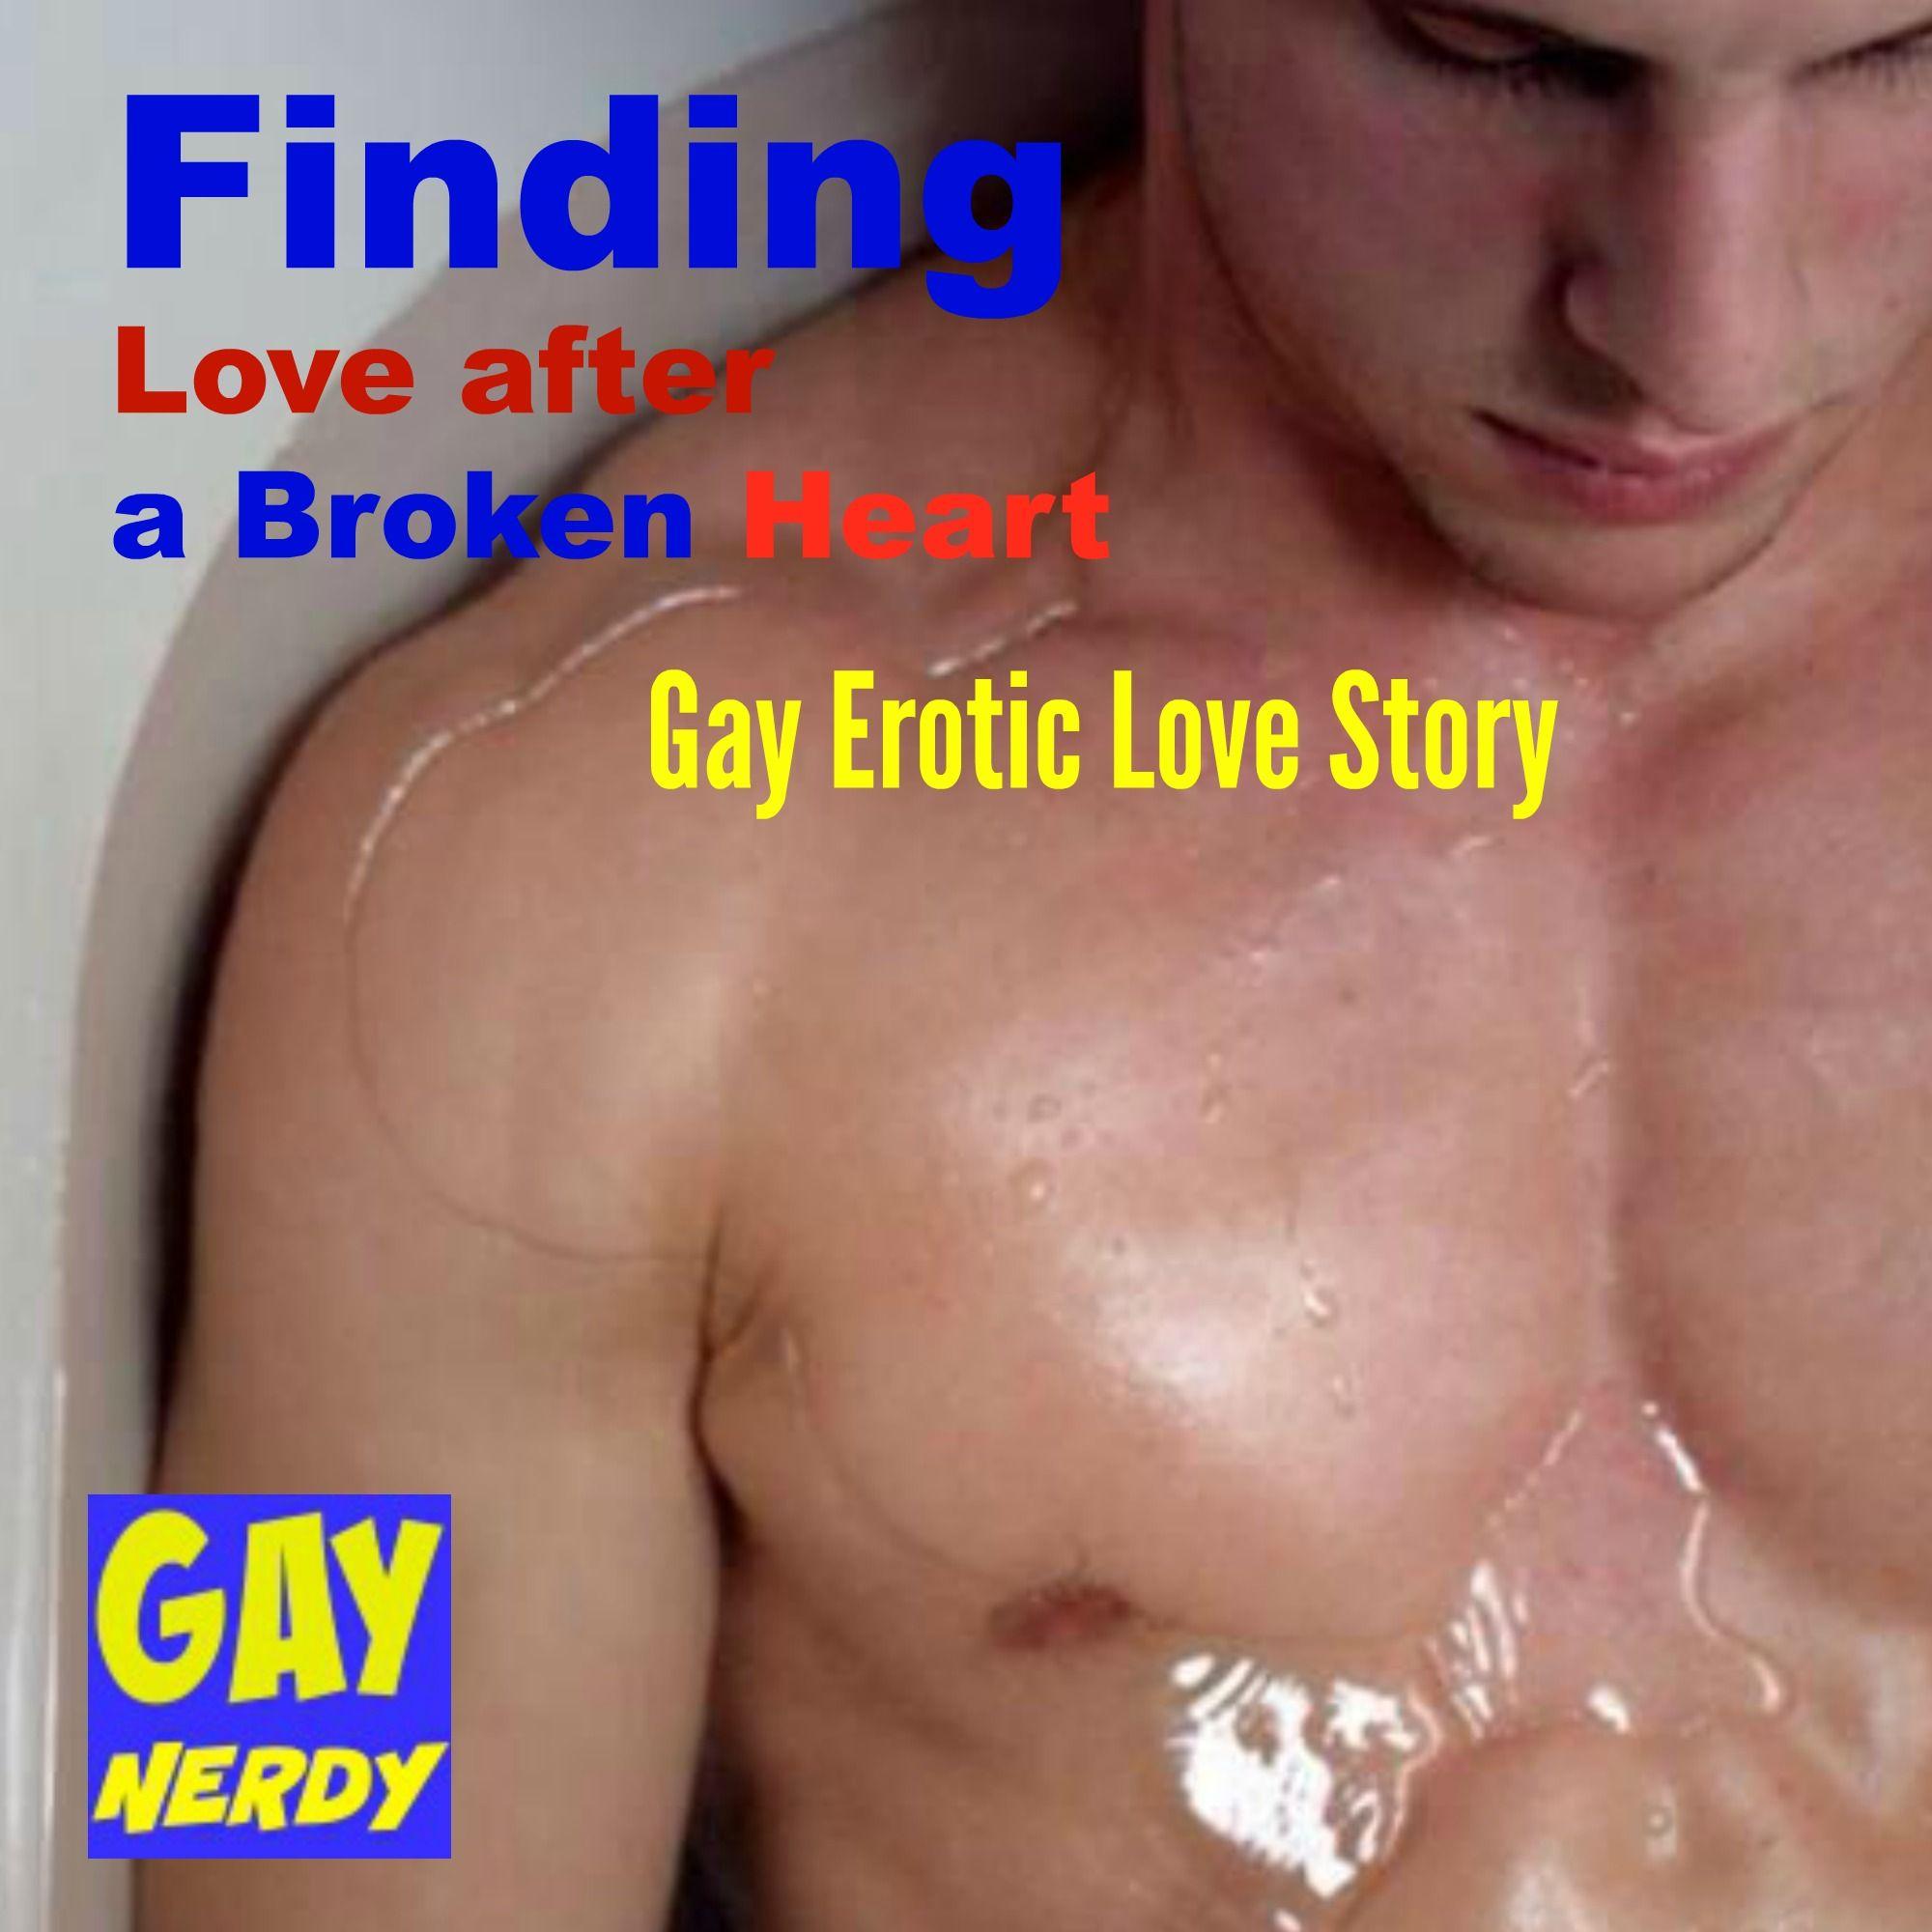 Story Erotic gay love